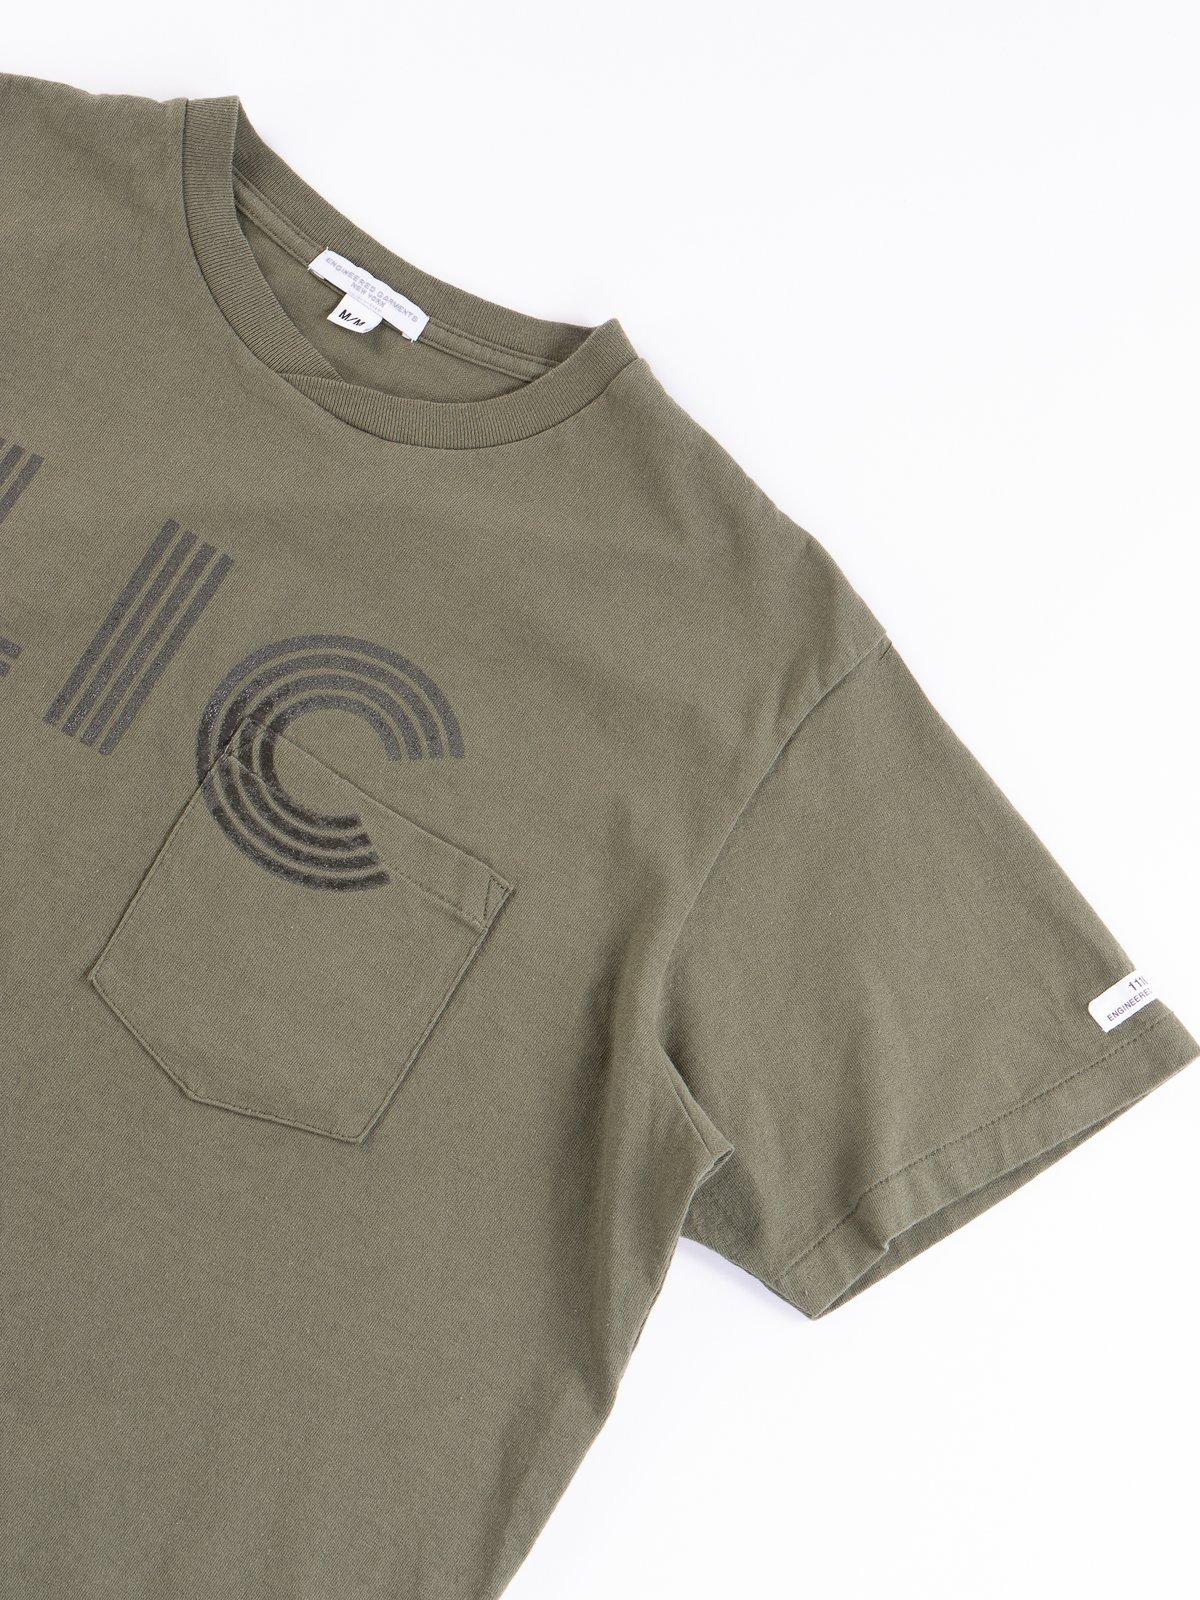 Olive LIC Printed T–Shirt - Image 4